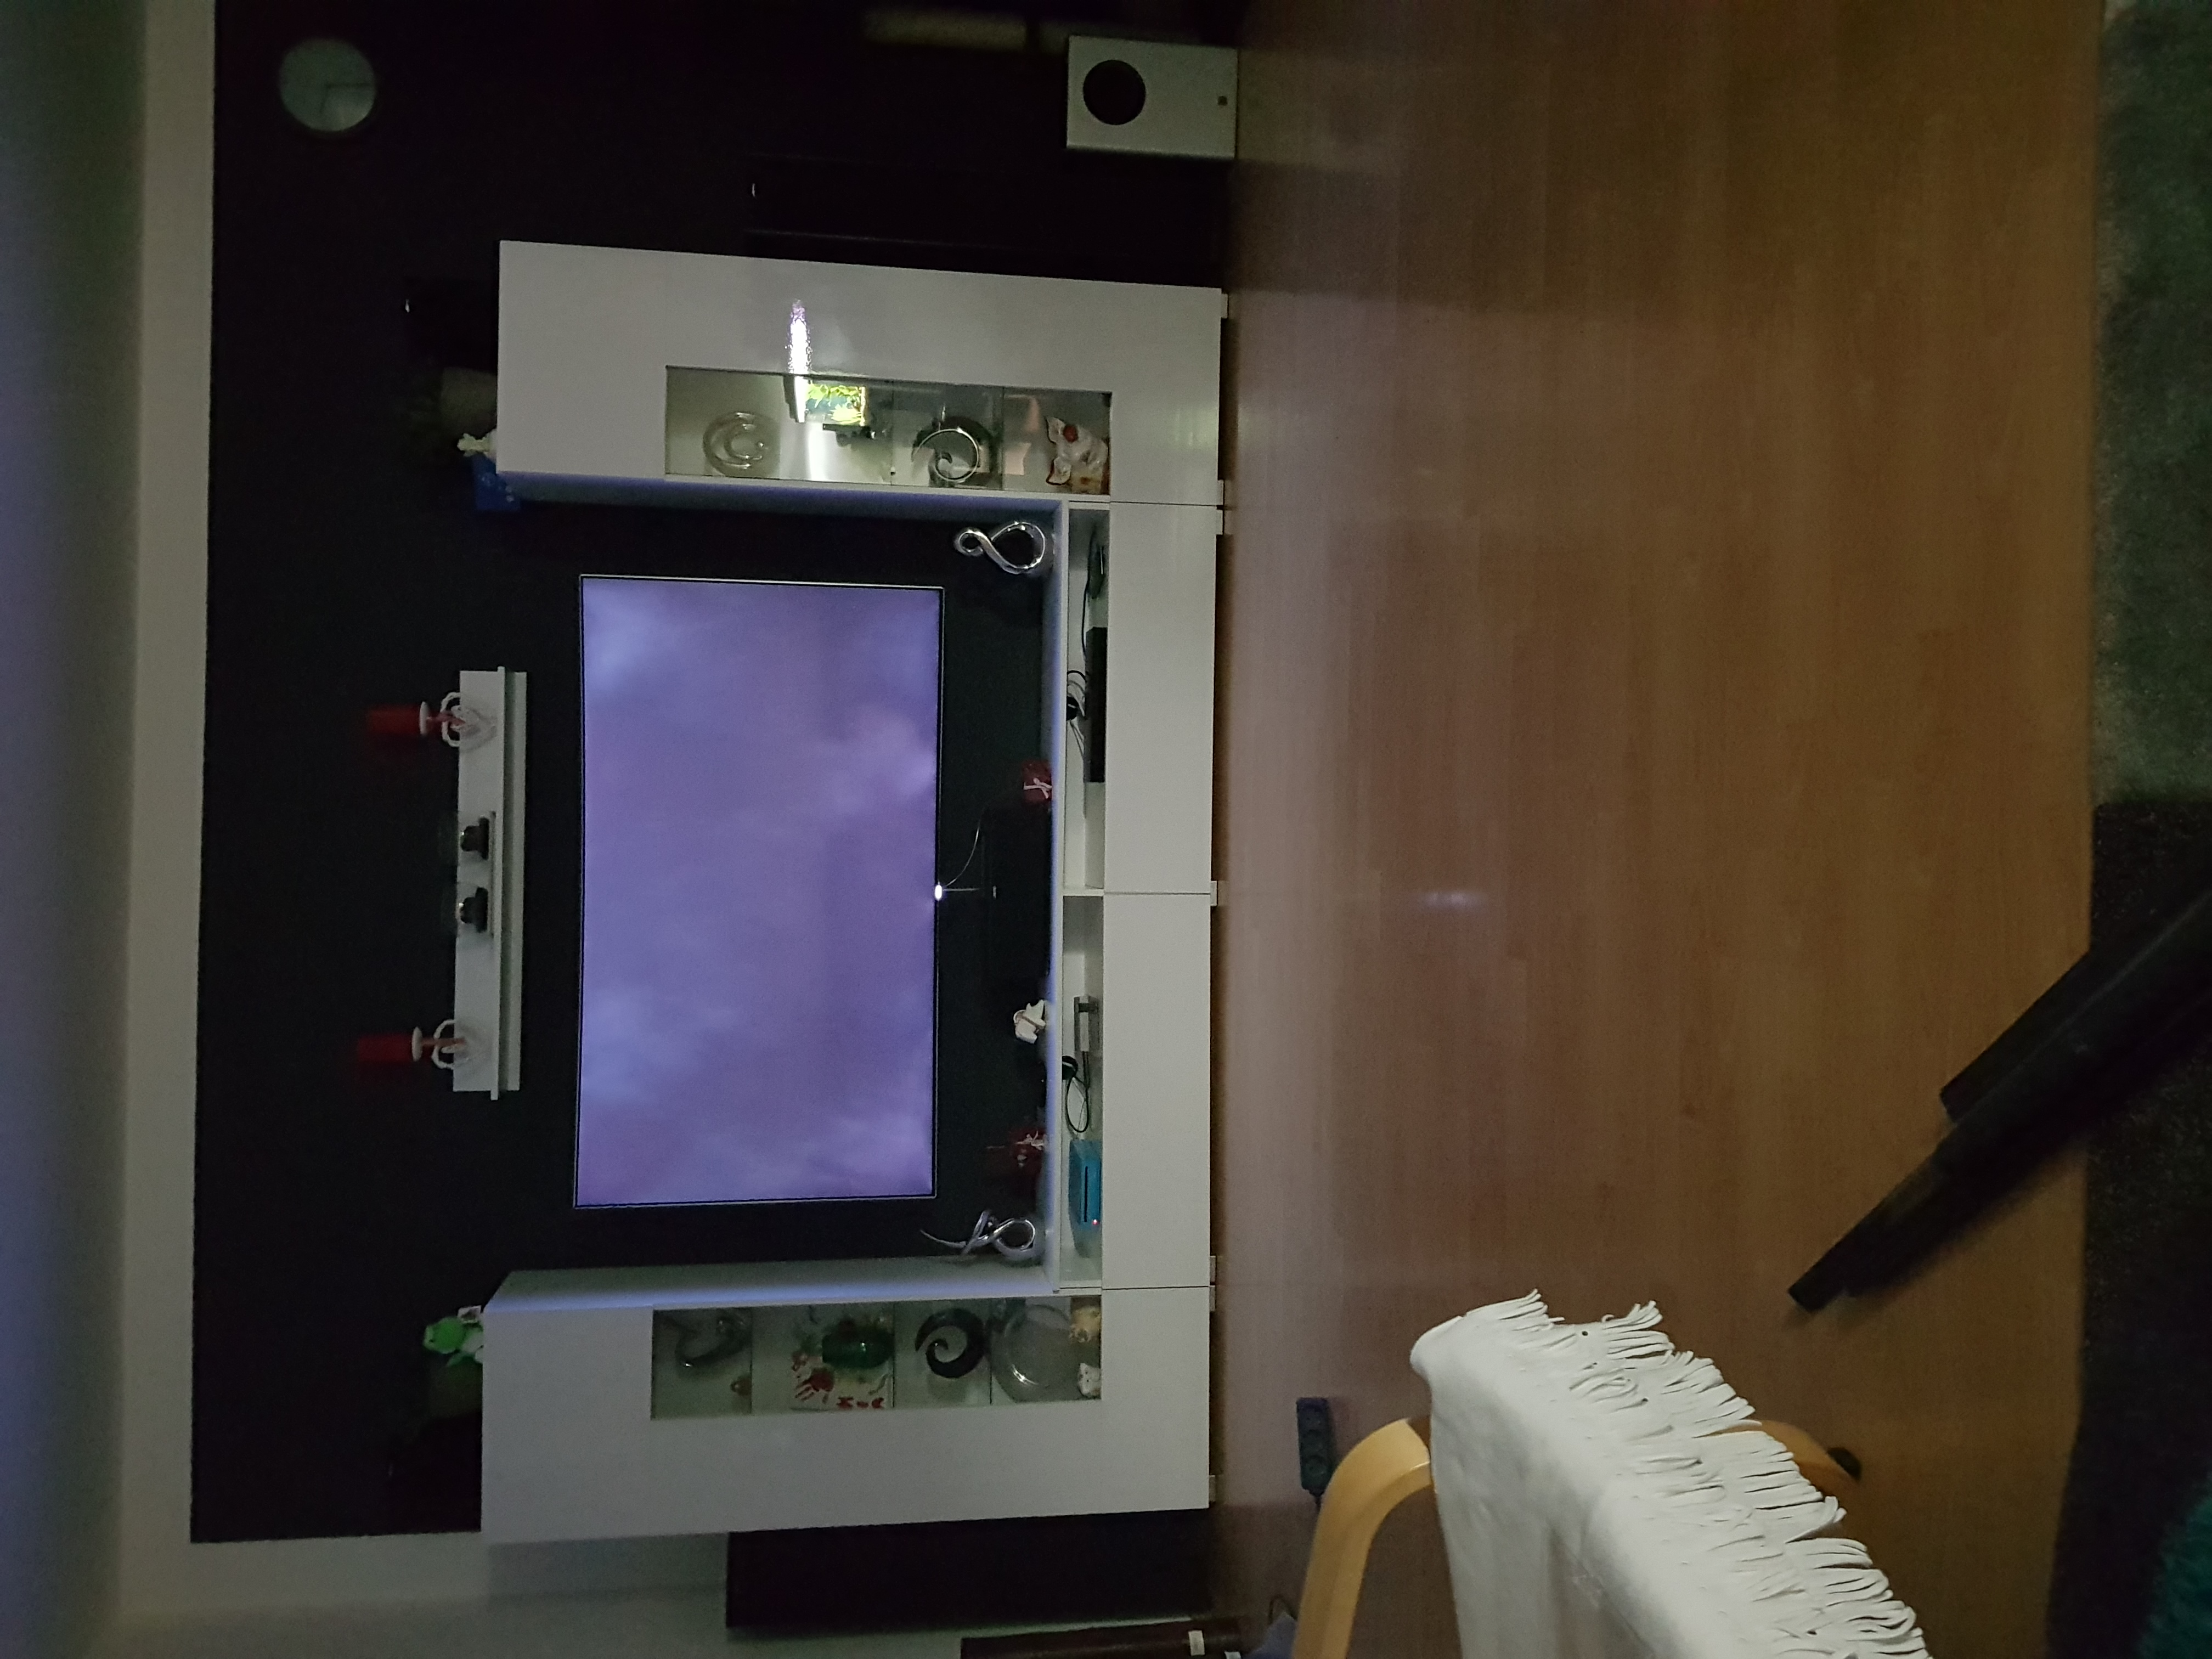 q8c 65 samsung clouding nach penneltausch samsung community. Black Bedroom Furniture Sets. Home Design Ideas